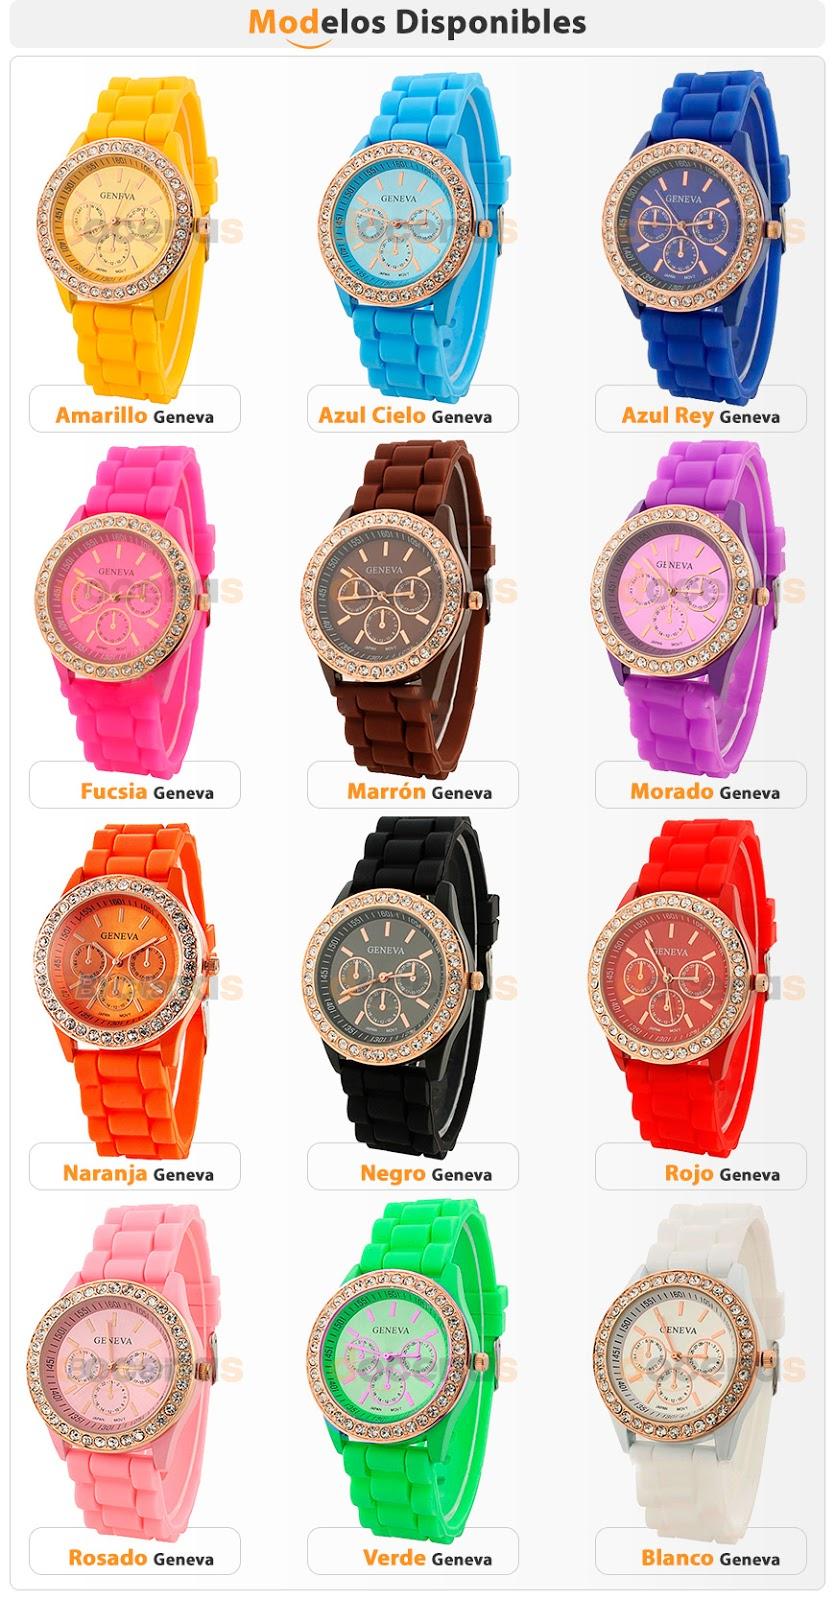 d6c4f2927fdc Relojes de DAMA marca GENEVA -MICHAEL KORS- MULCO- TECHNOSPORT - muchos  modelos